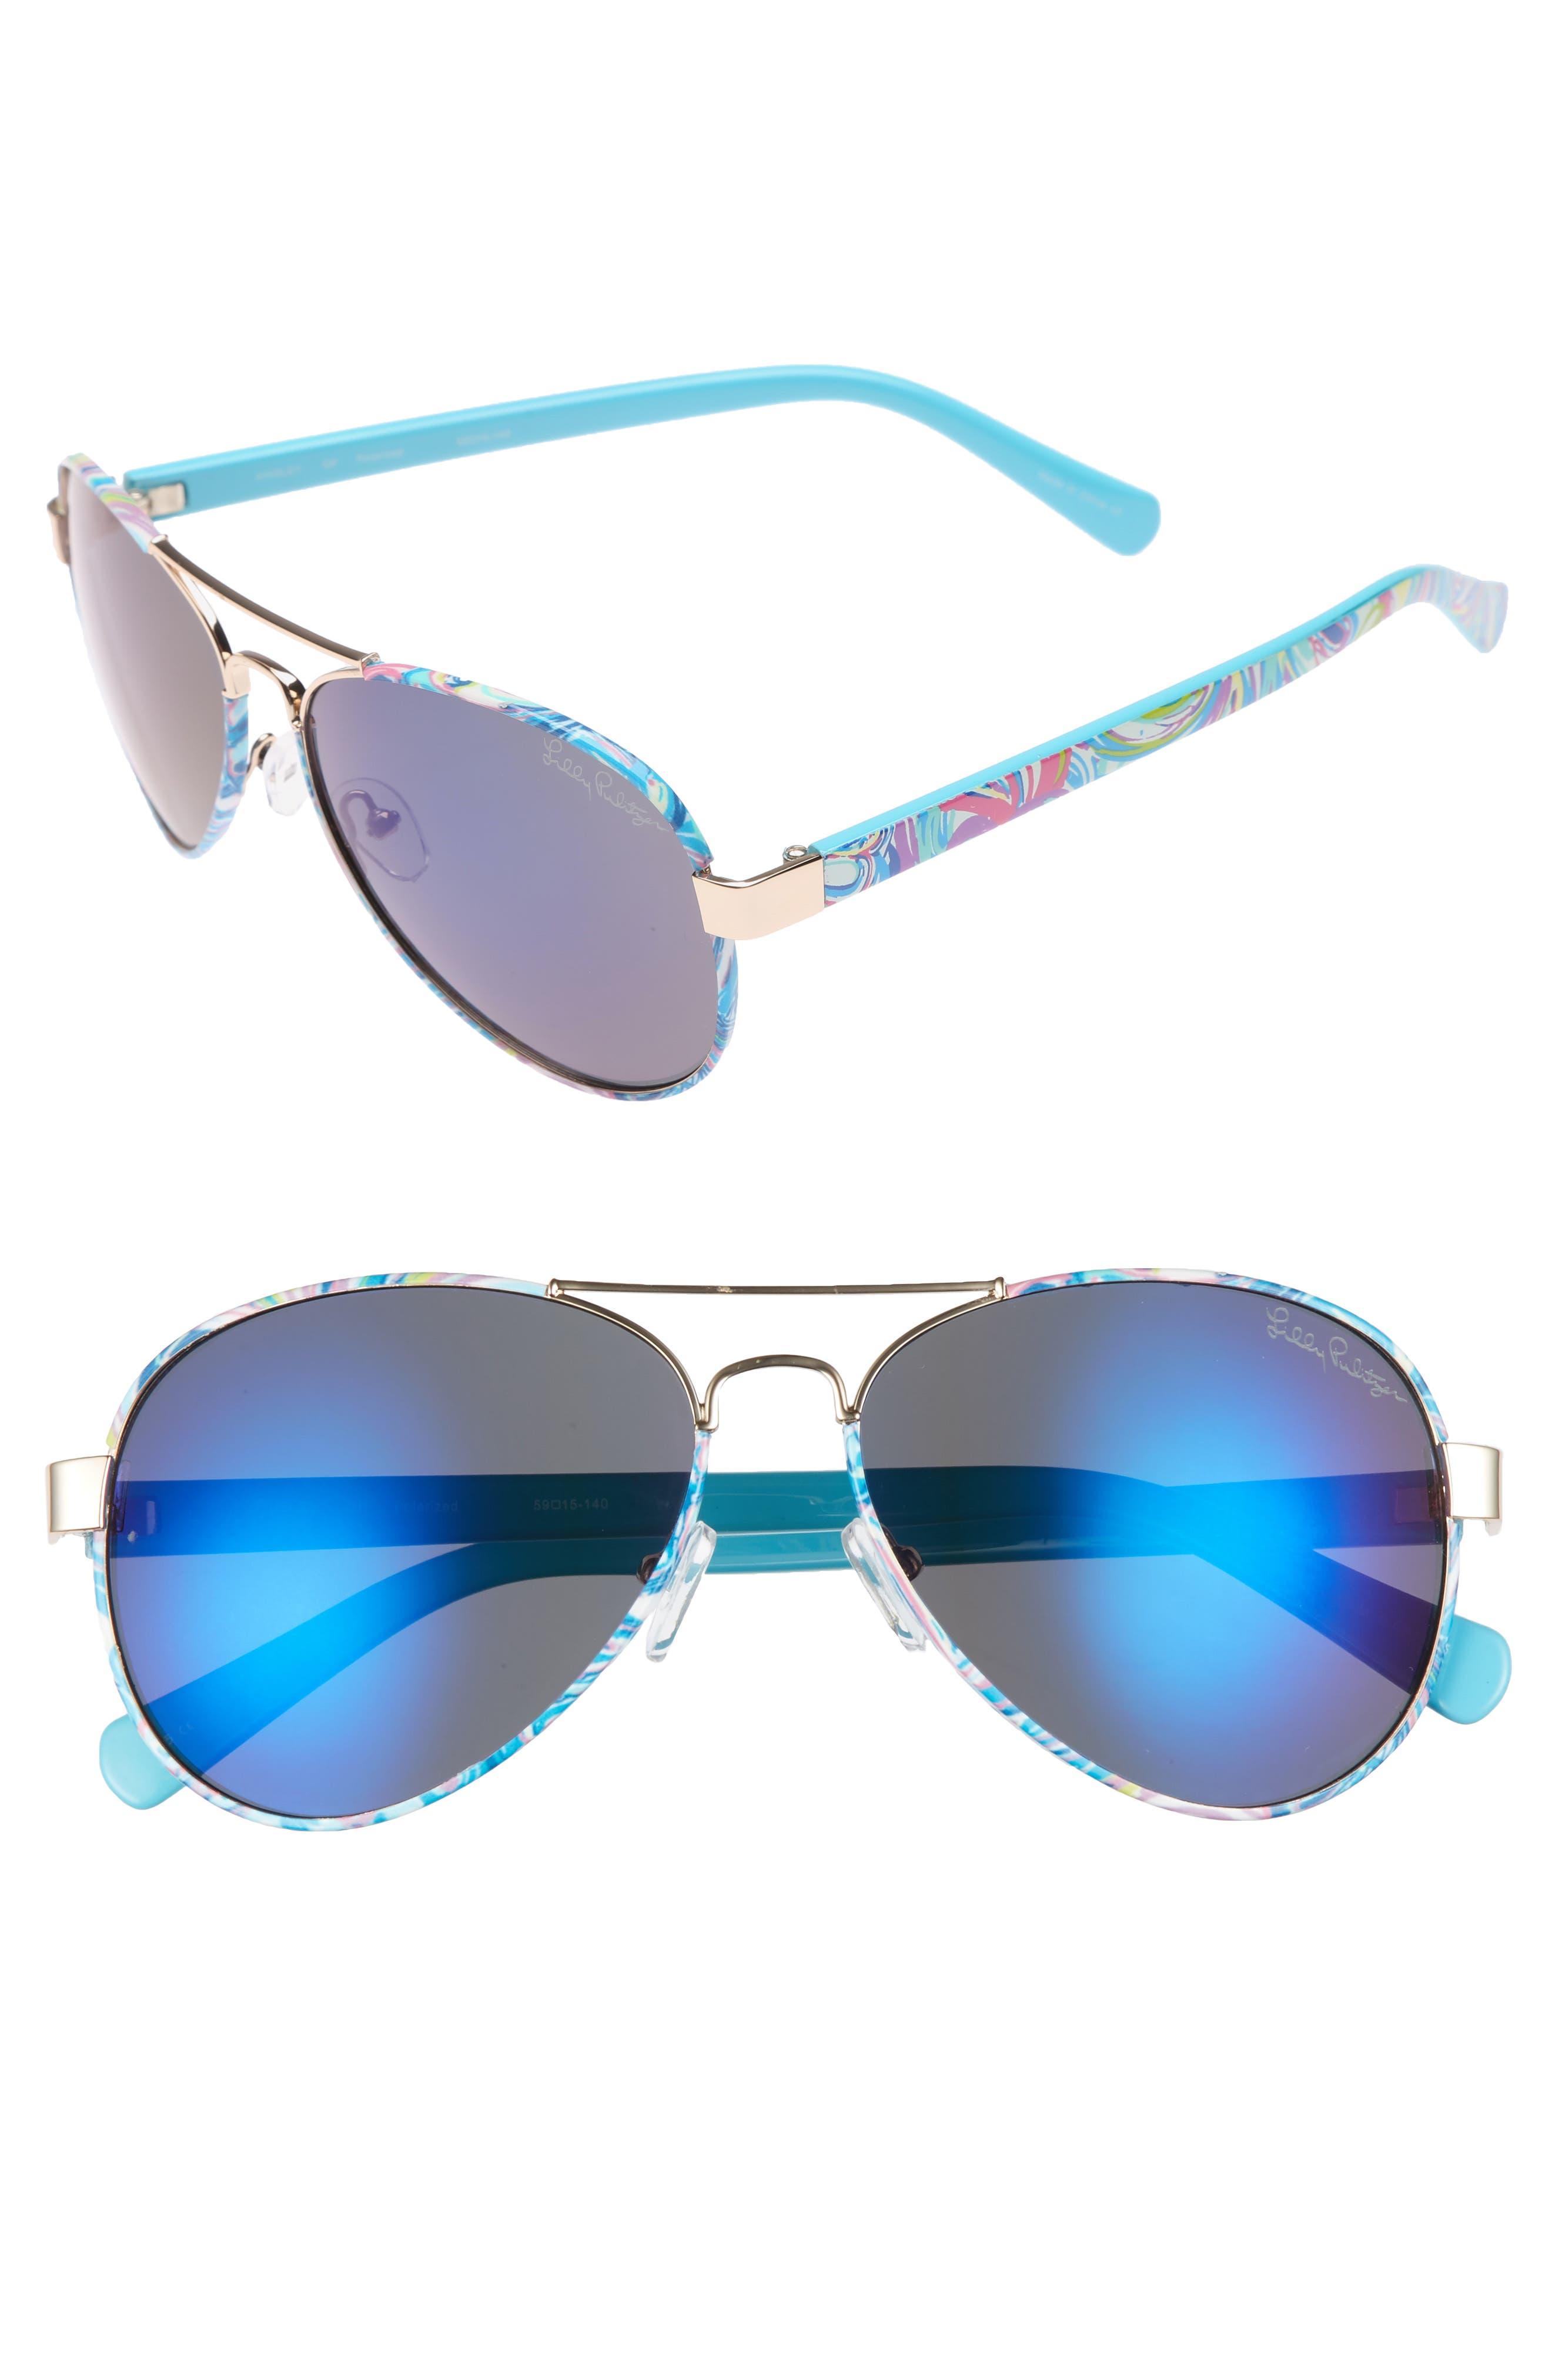 Main Image - Lilly Pulitzer® Ainsley 59mm Polarized Aviator Sunglasses